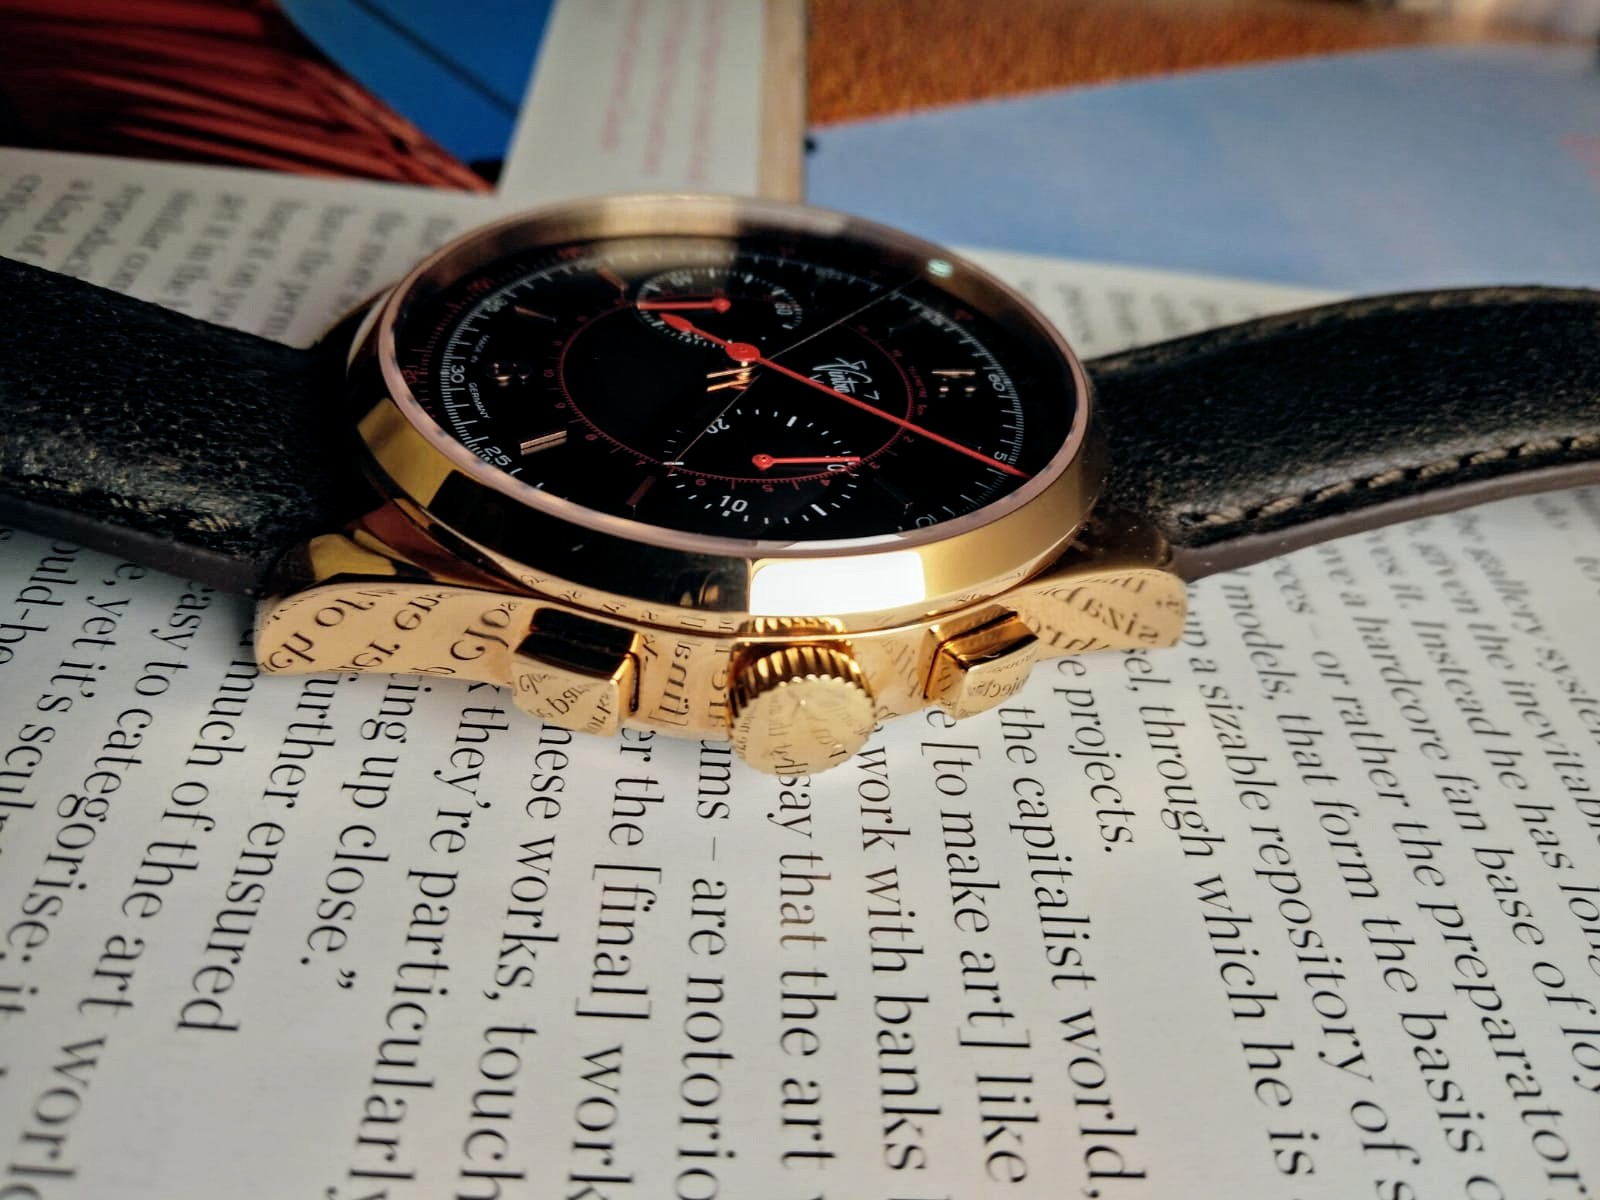 Rose gold casing Le Mans 1952 Chronograph